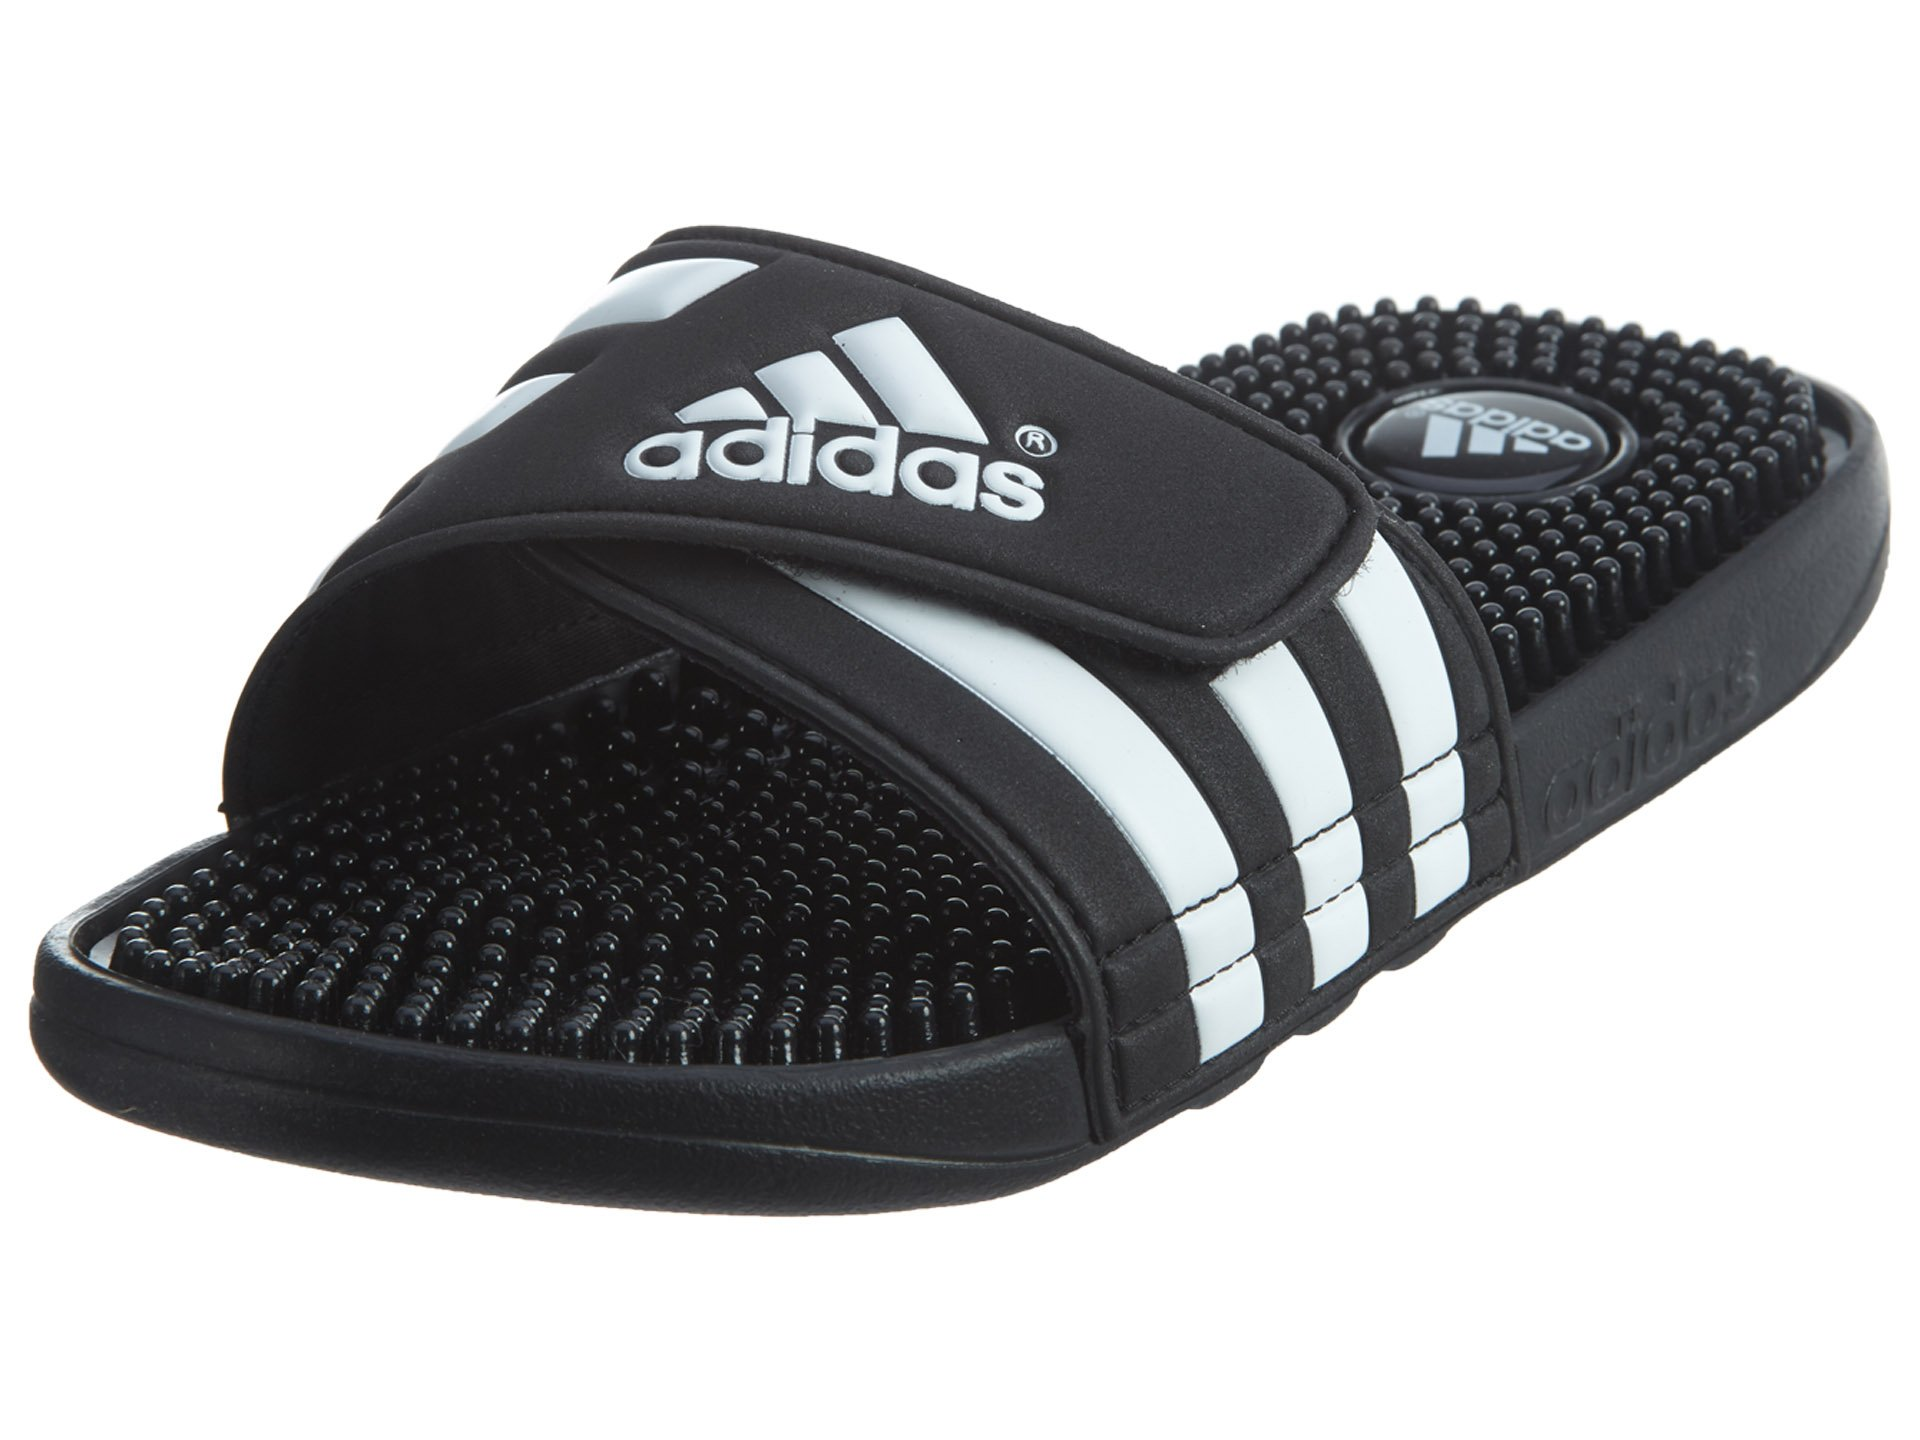 Adidas Adissage Big Kids Style: 078285-BLACK/RUNWHI/BLACKNOIR Size: 3